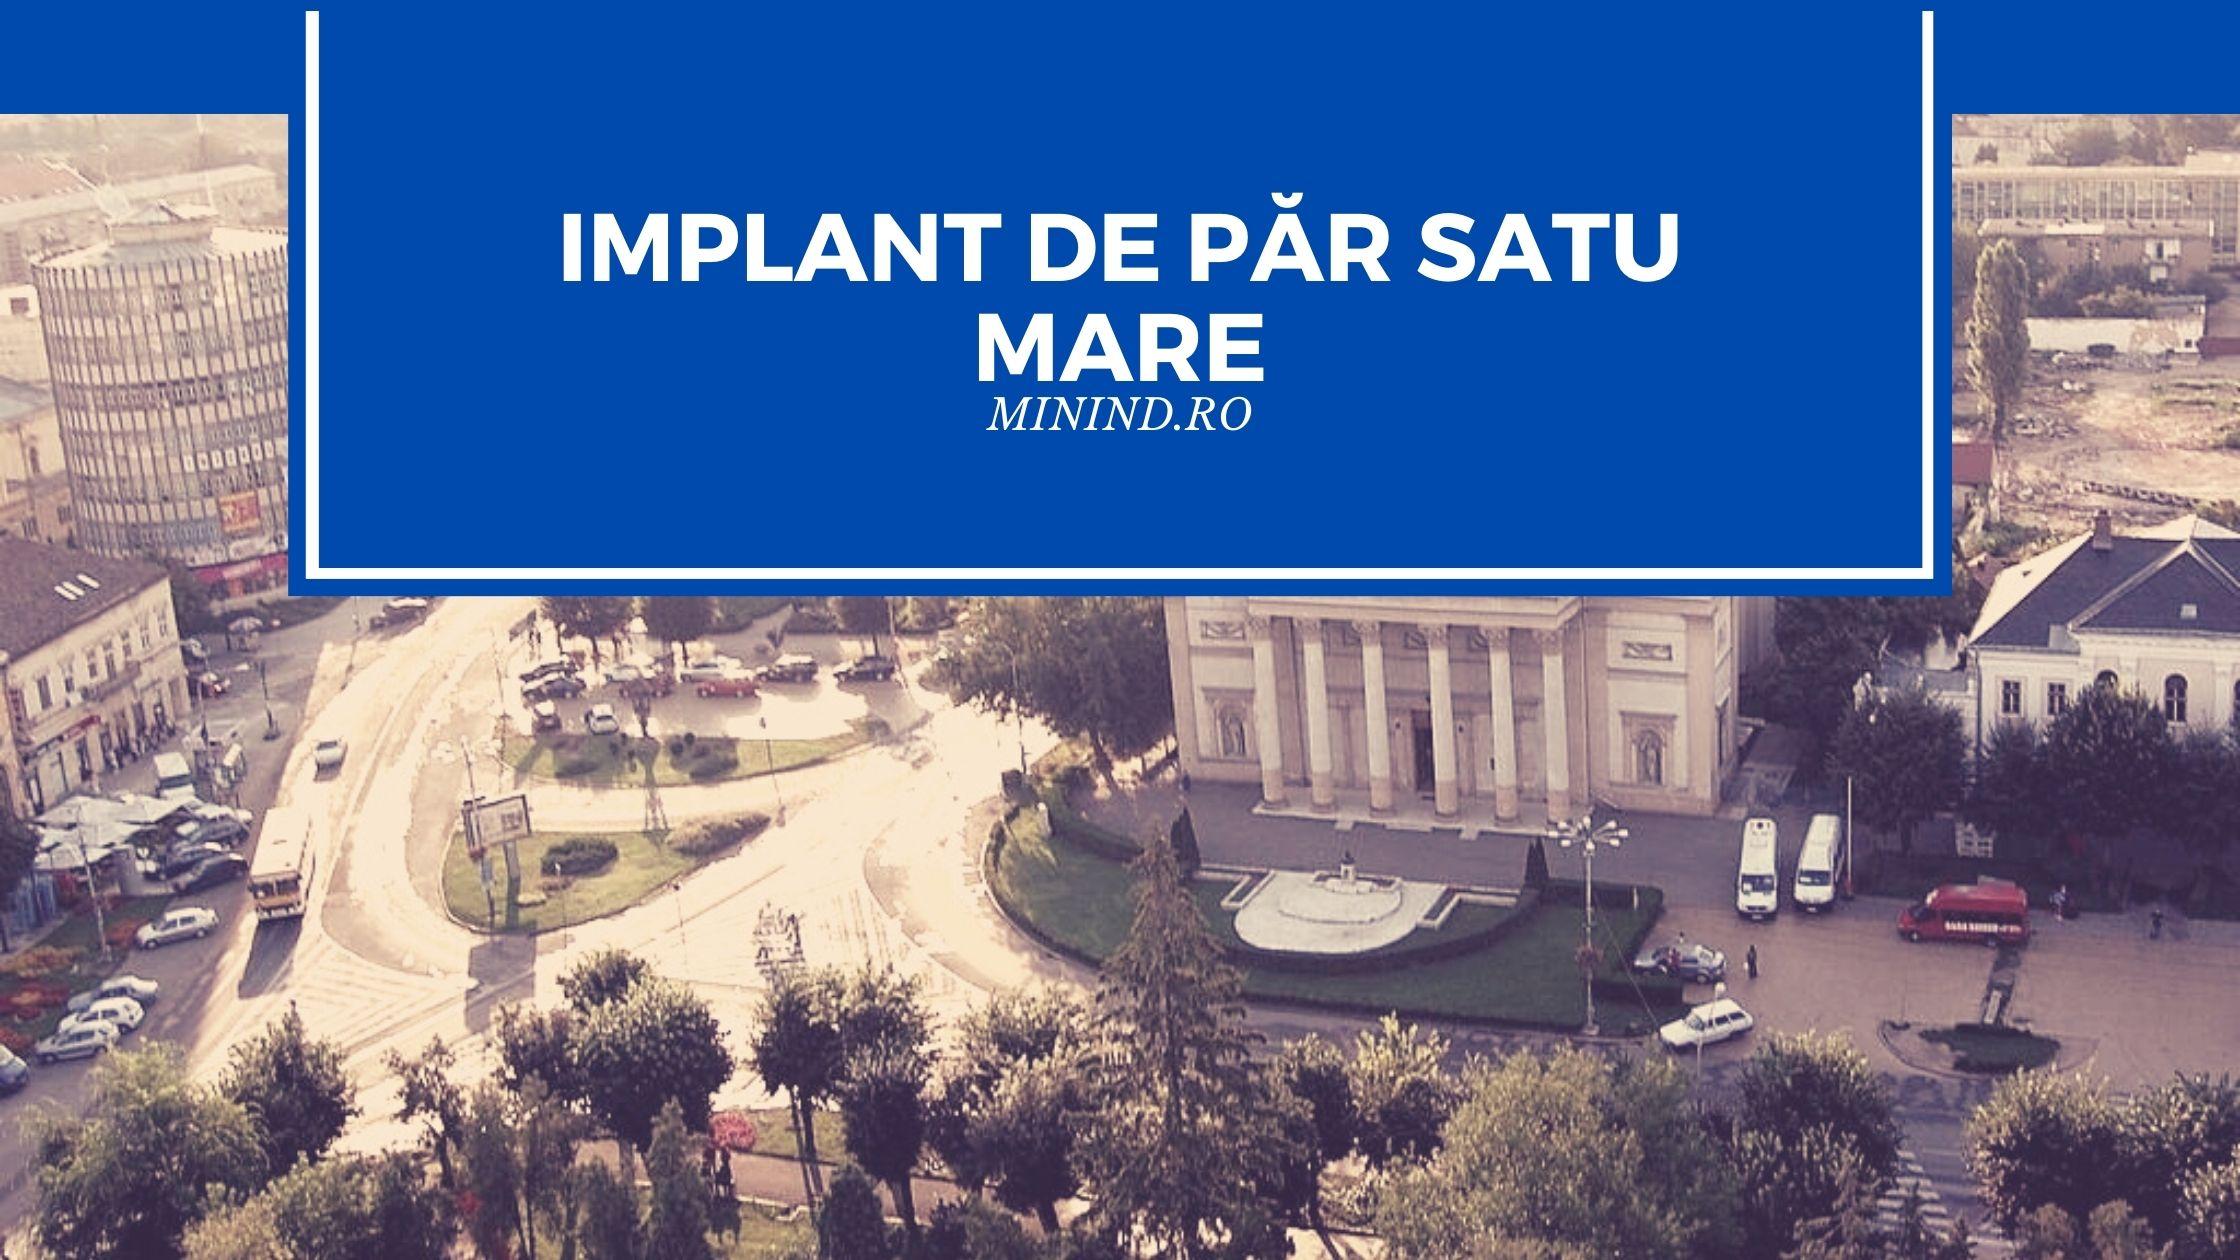 implant de par satu mare